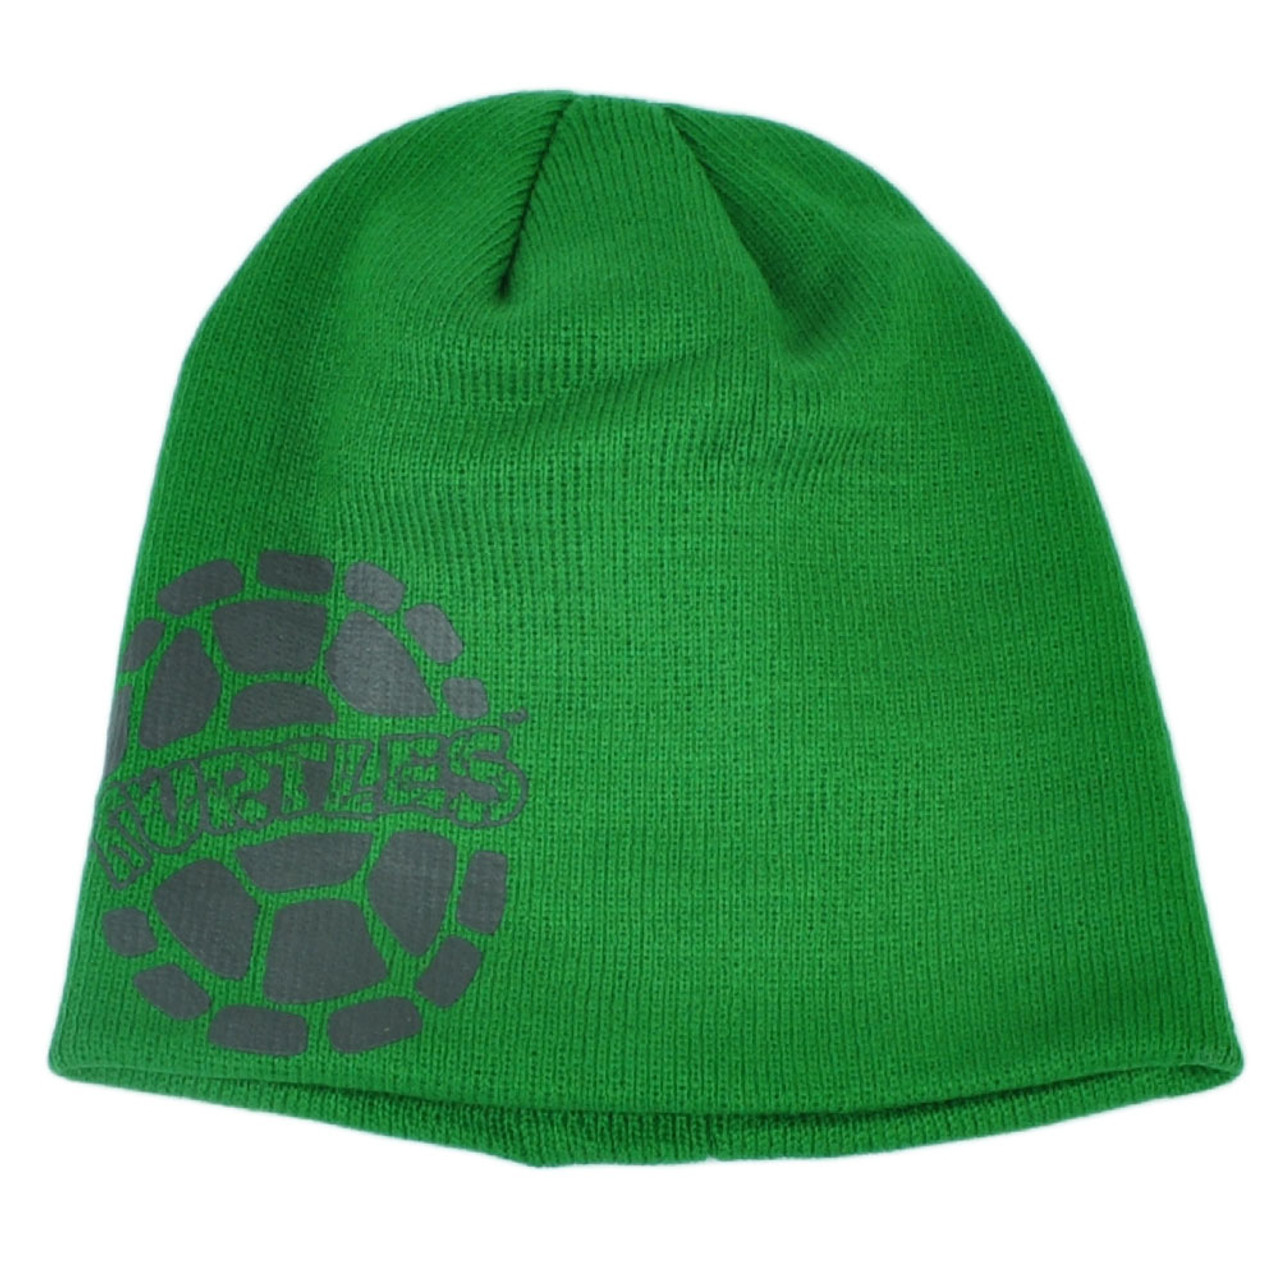 7b8eef387 Teenage Mutant Ninja Turtles Cuffless Knit Beanie Green Winter Cartoon Toque